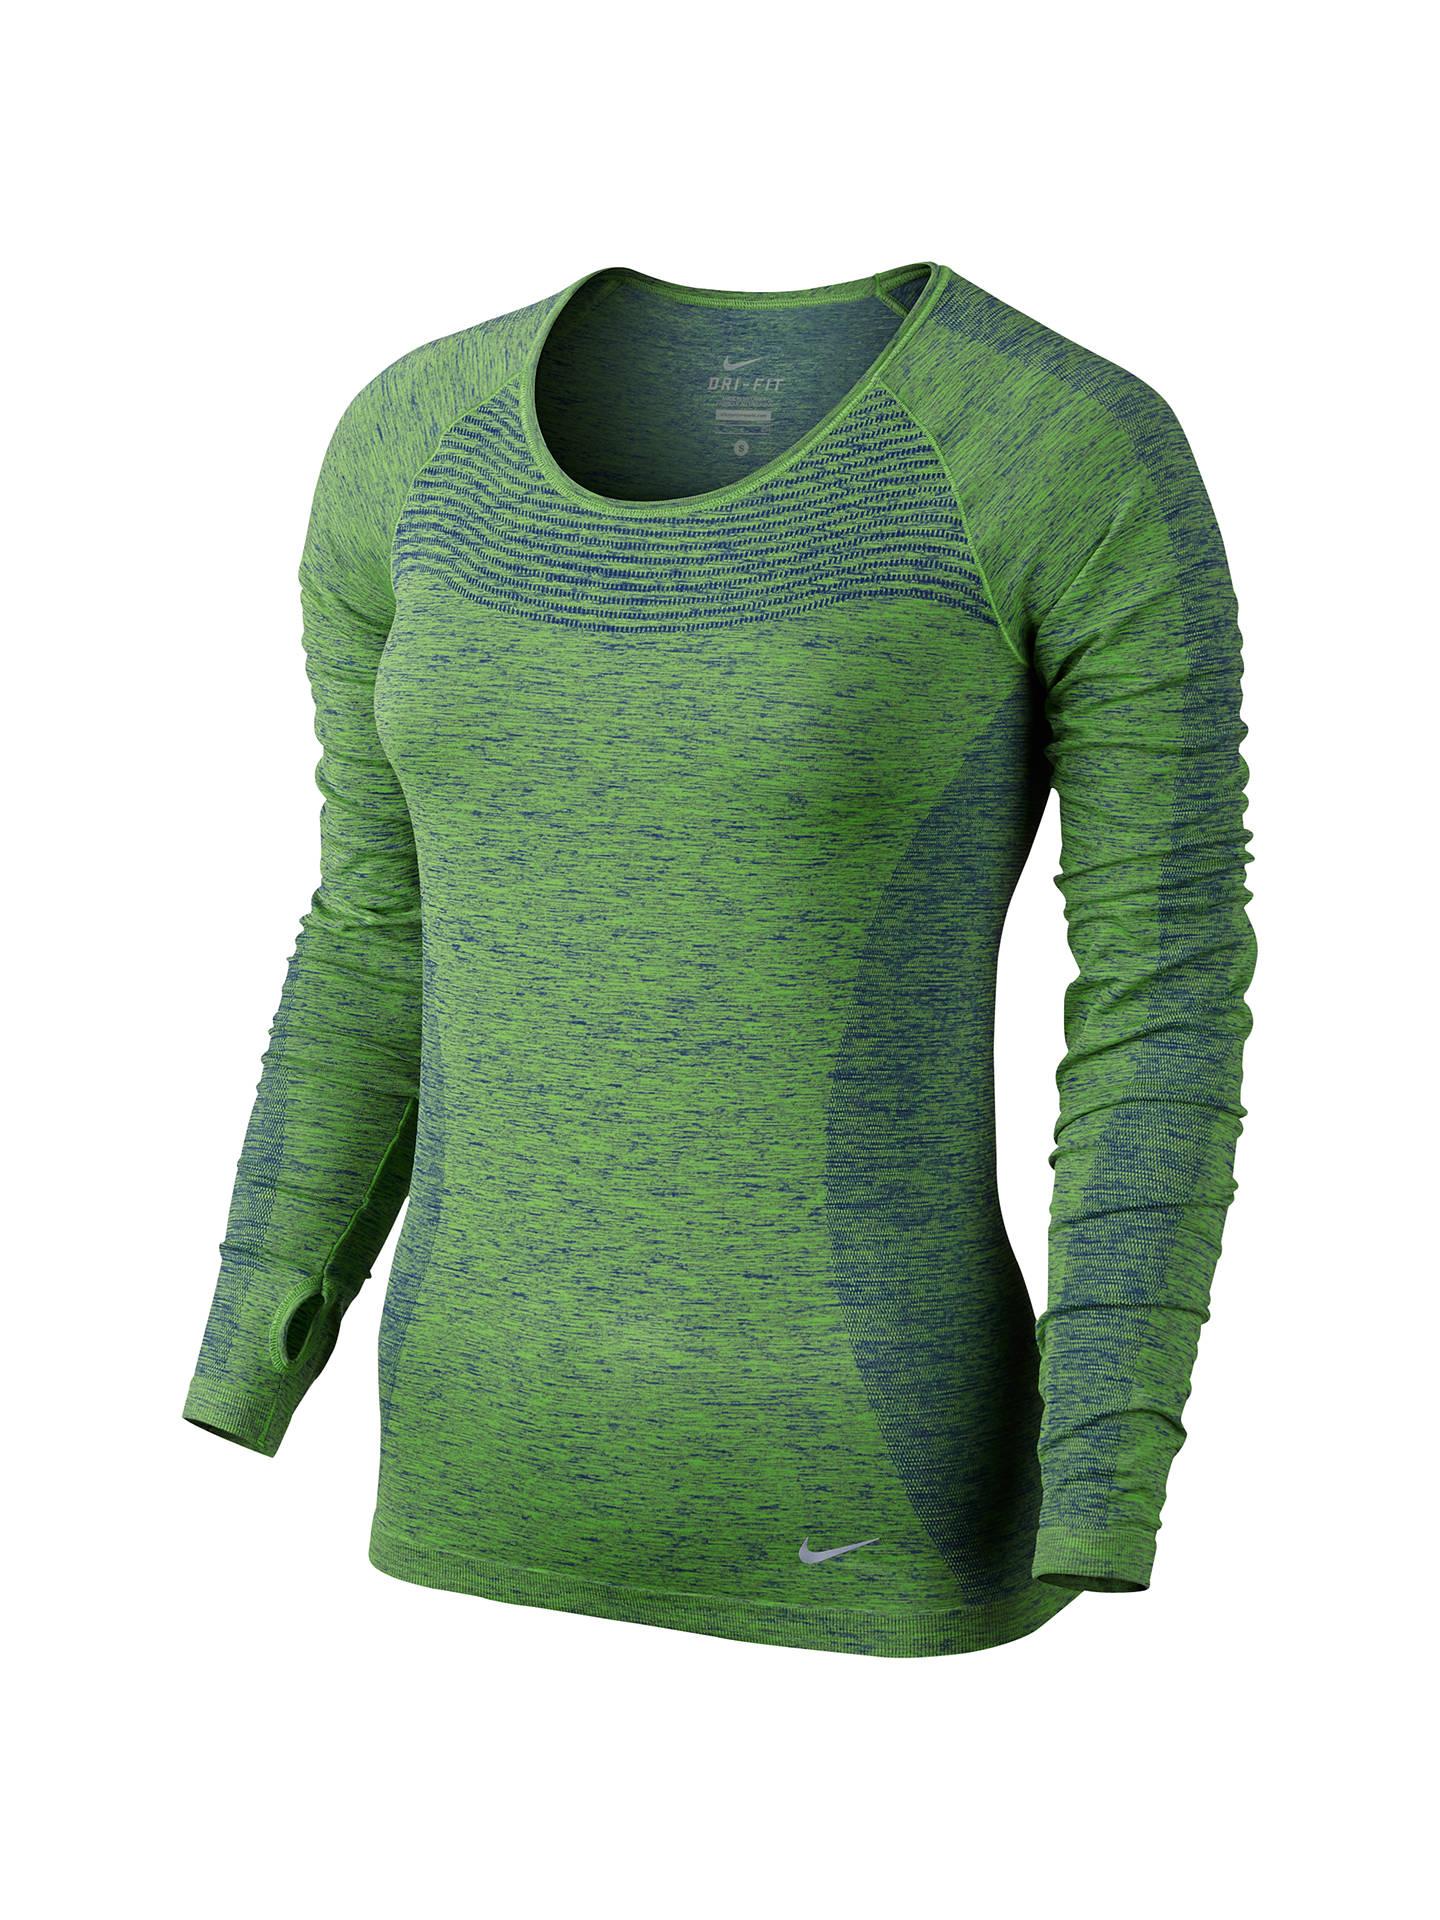 9417be9e4 Buy Nike Dri-FIT Knit Long Sleeve Running Top, Deep Royal Blue/Action ...